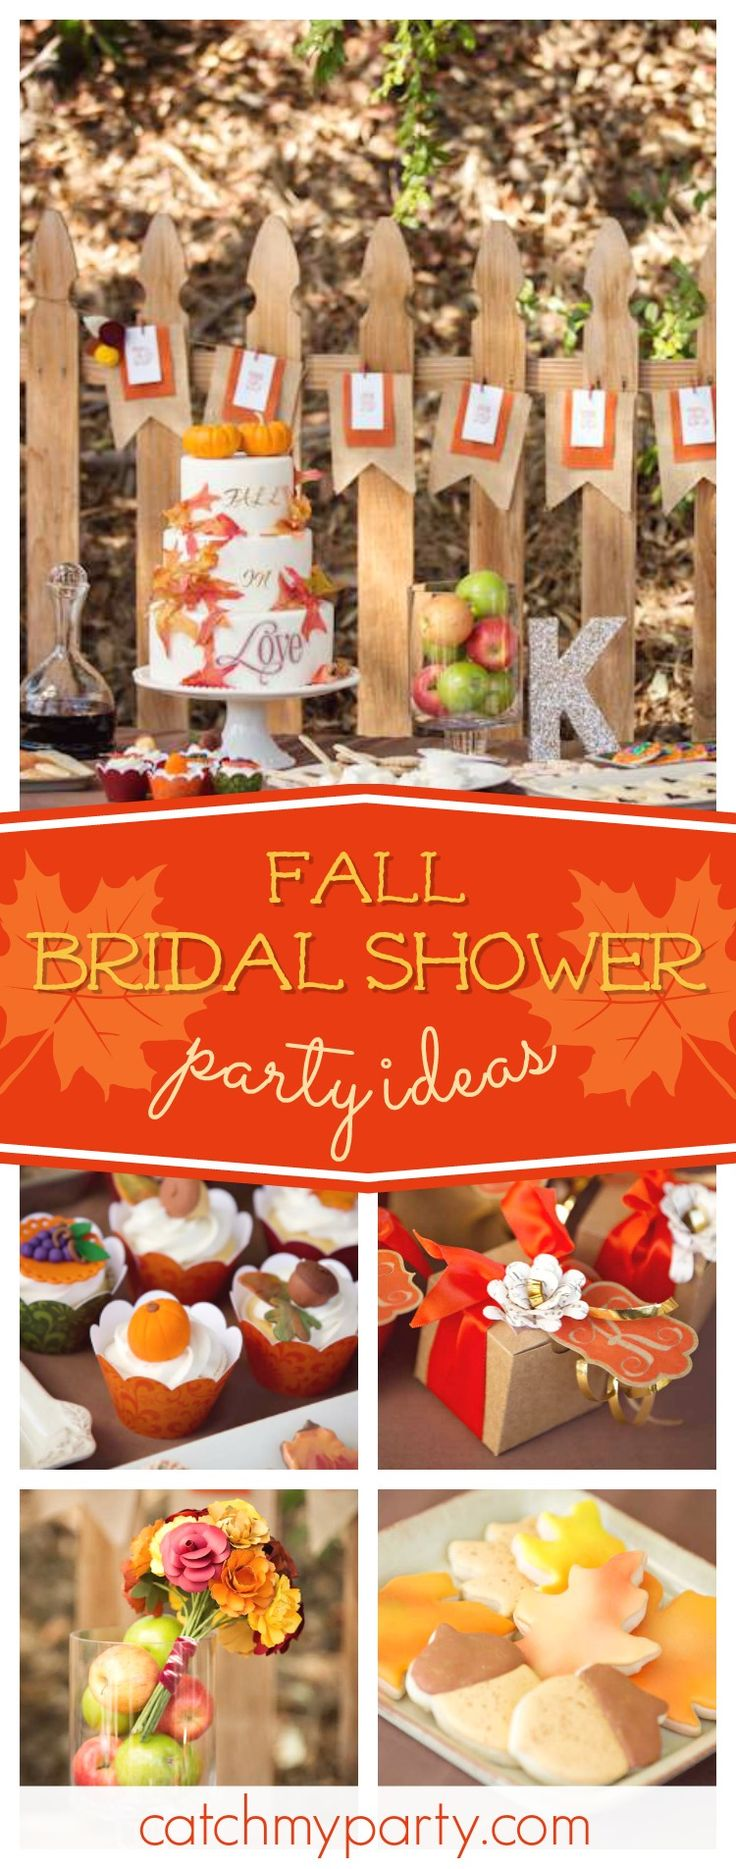 Donu0027t miss this wonderful Fall Wedding Bridal